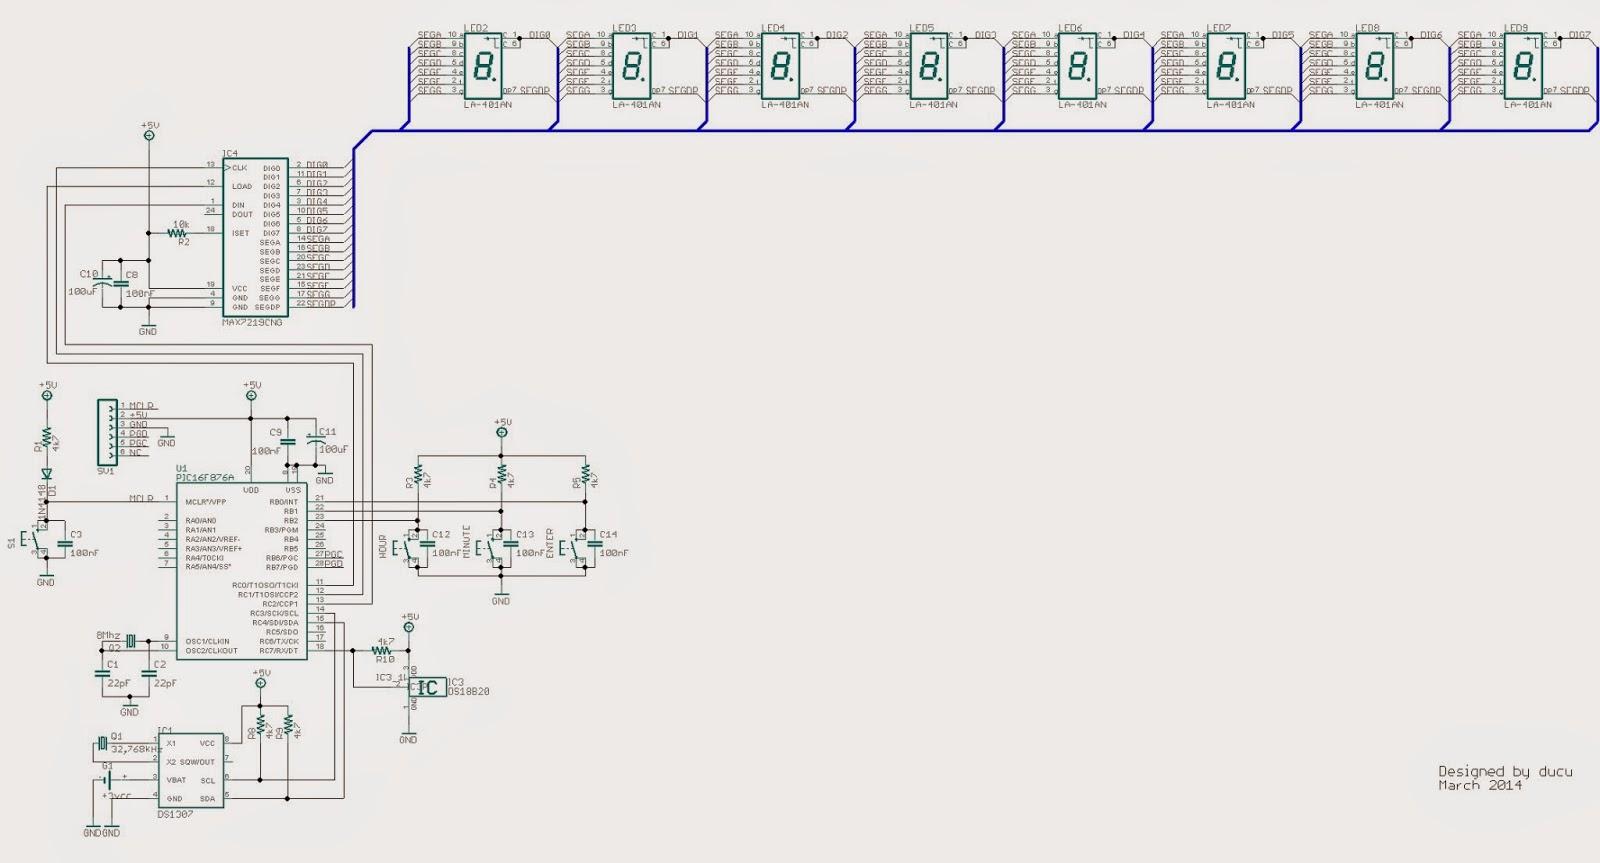 Schema+Electrica+rtc&max_edited_001.bmp